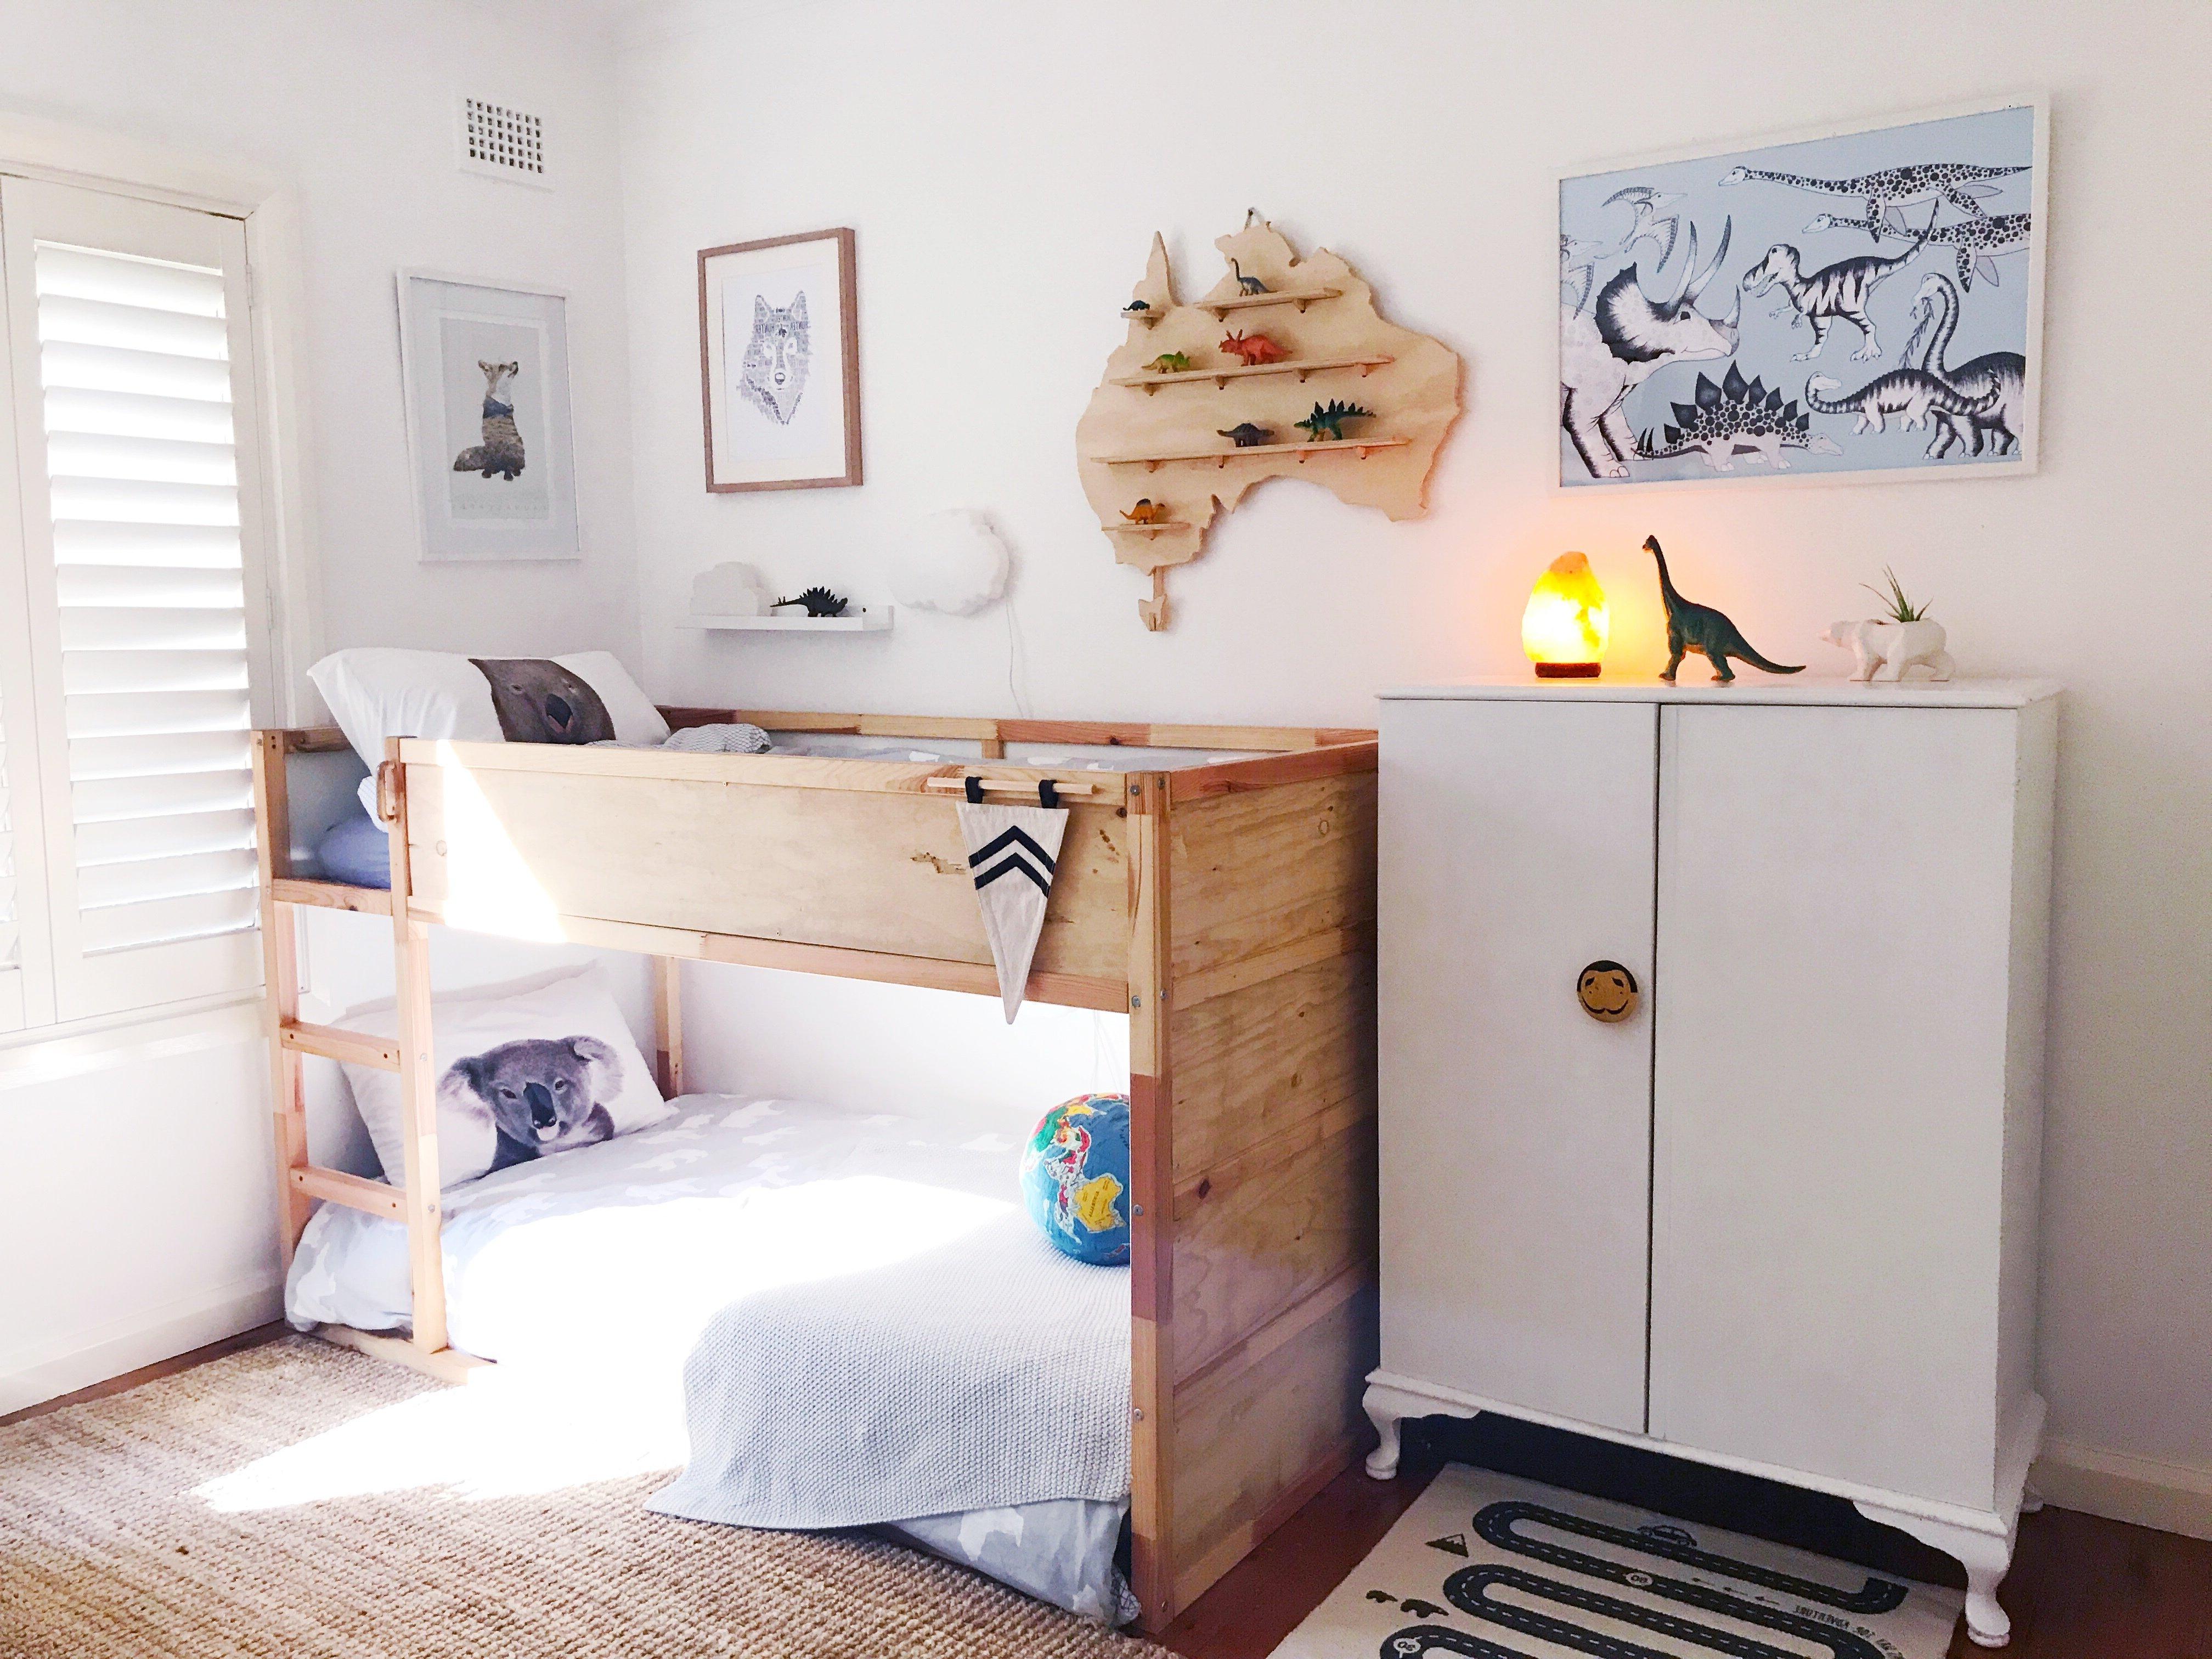 Kura Ikea Bett selber machen - Ikea Hochbett für kleines Kind